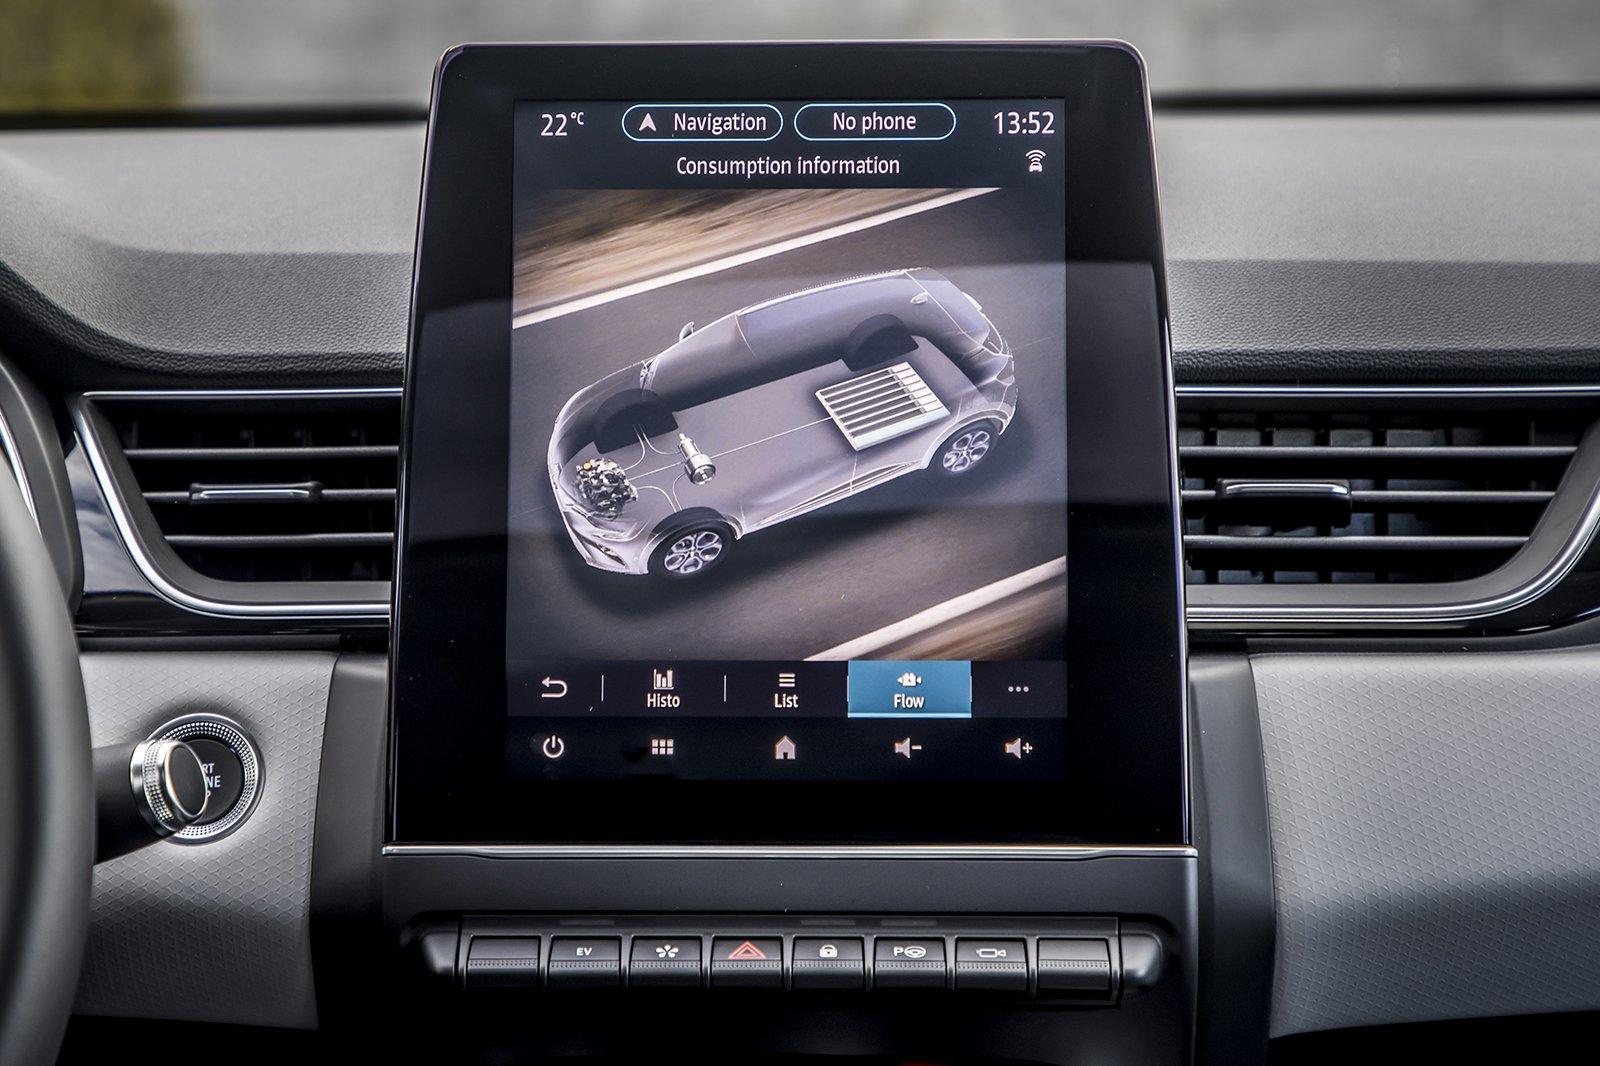 Renault Captur 2020 infotainment